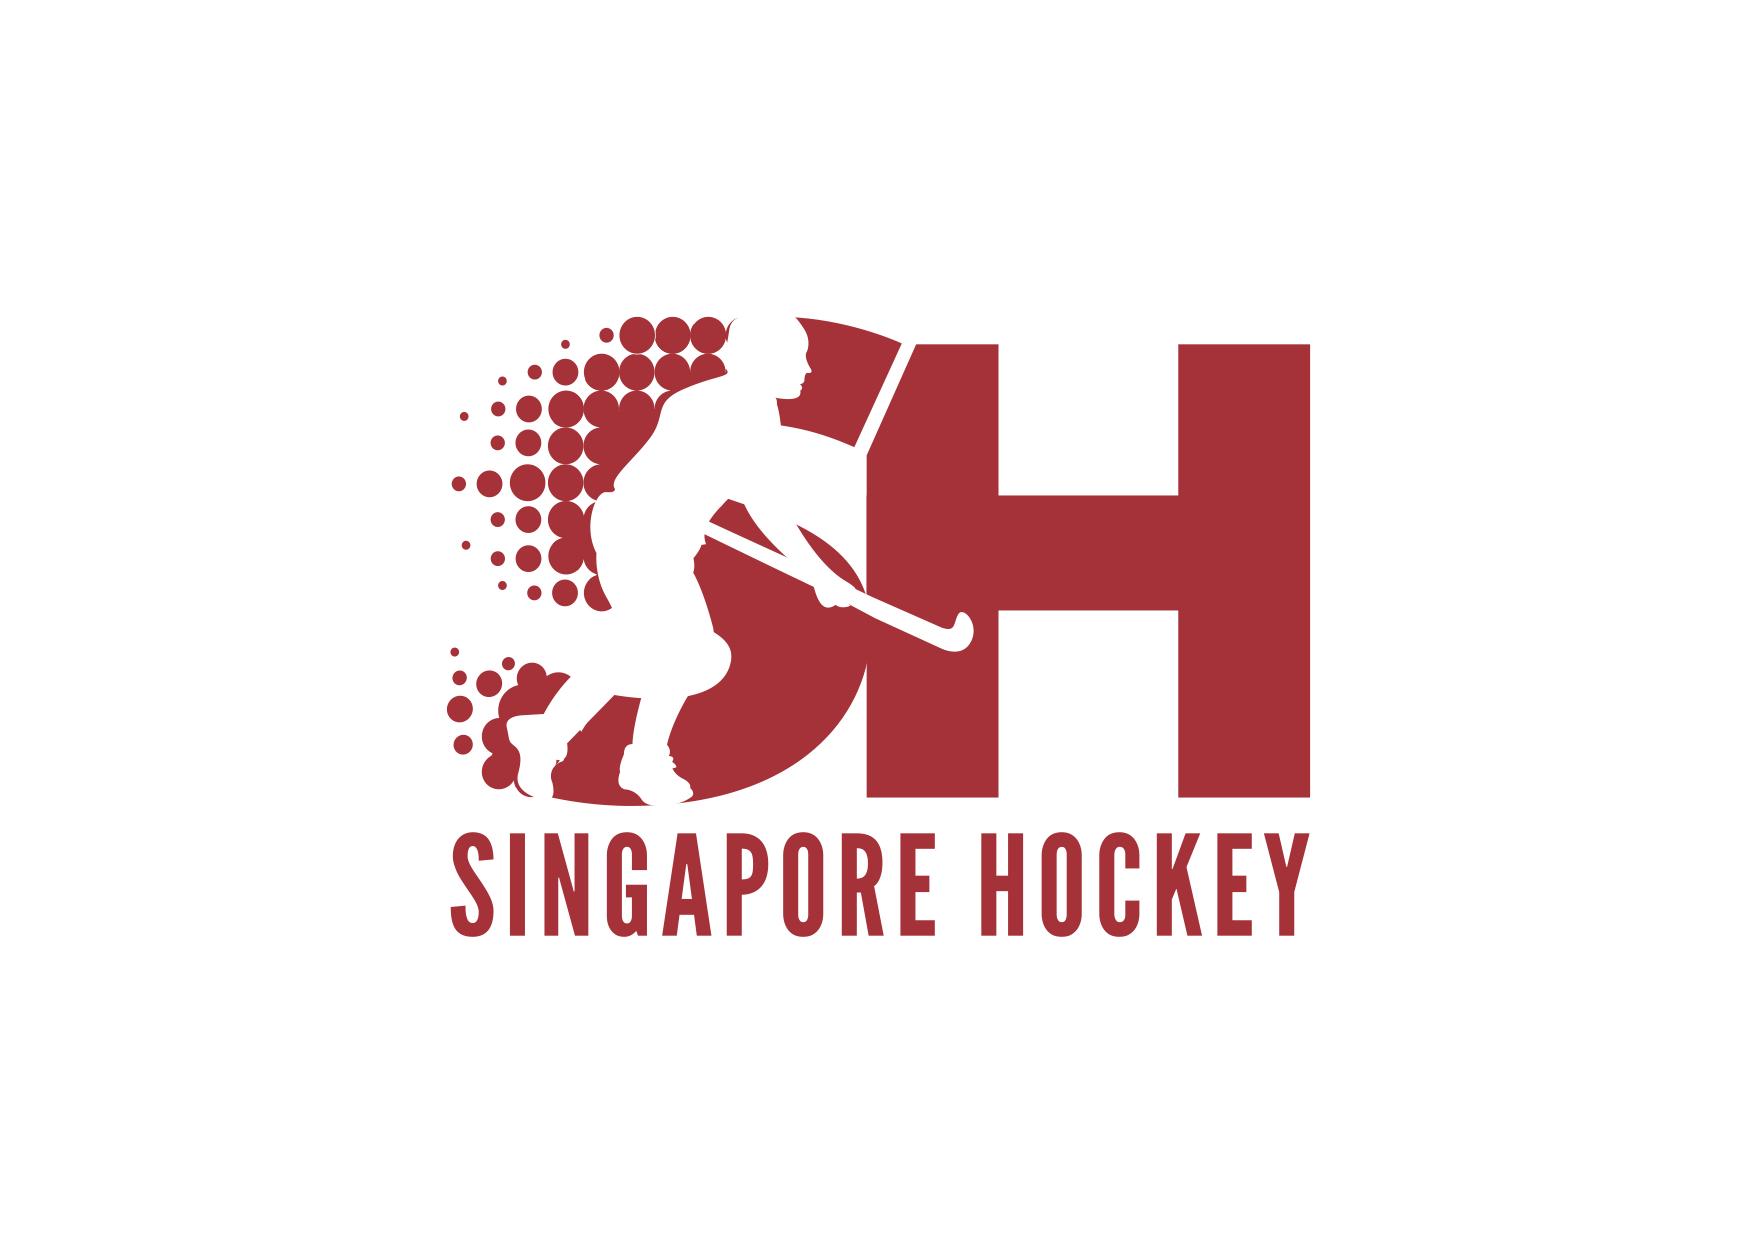 Singapore Hockey